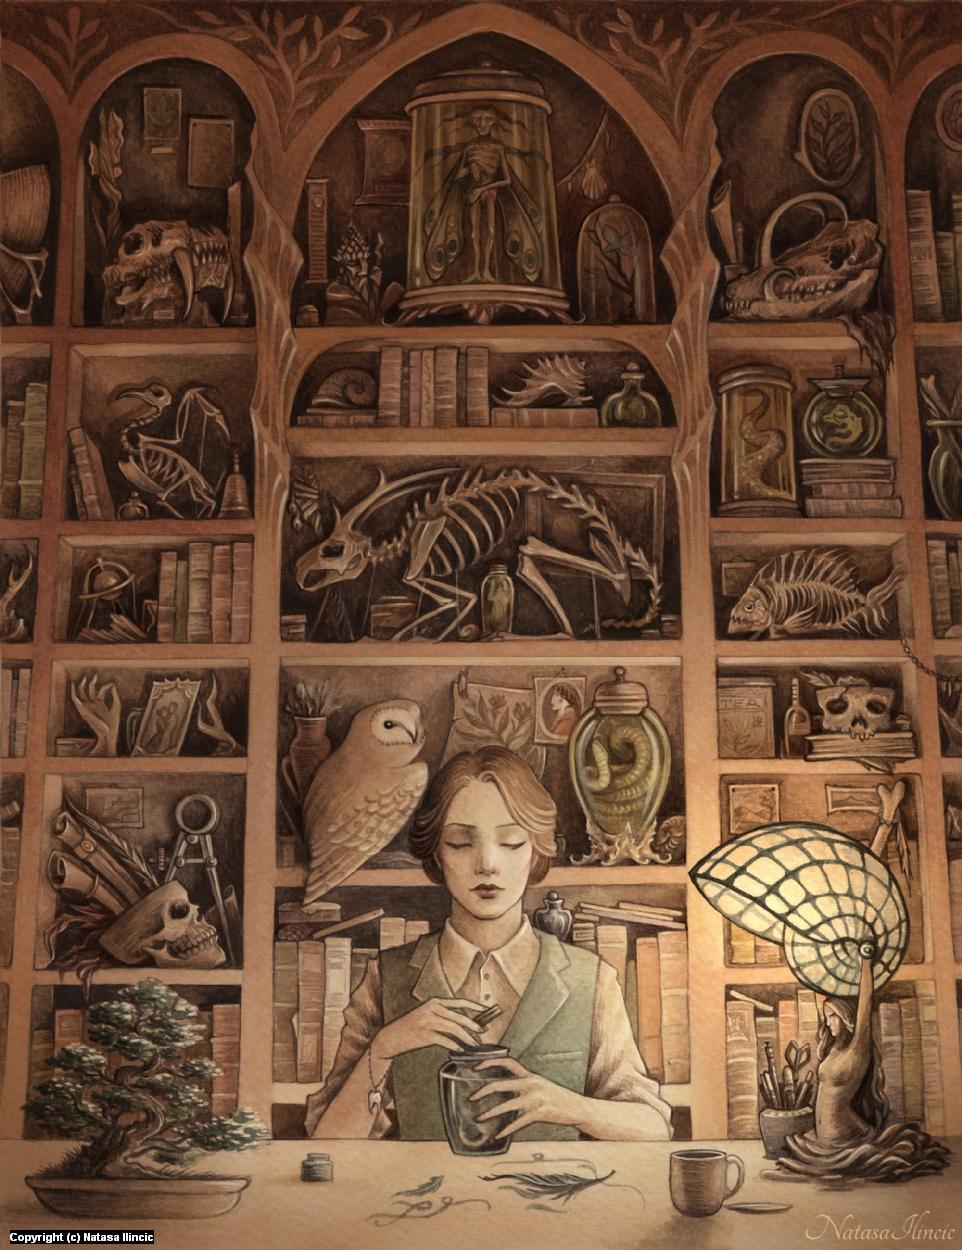 Magpie Artwork by Natasa Ilincic